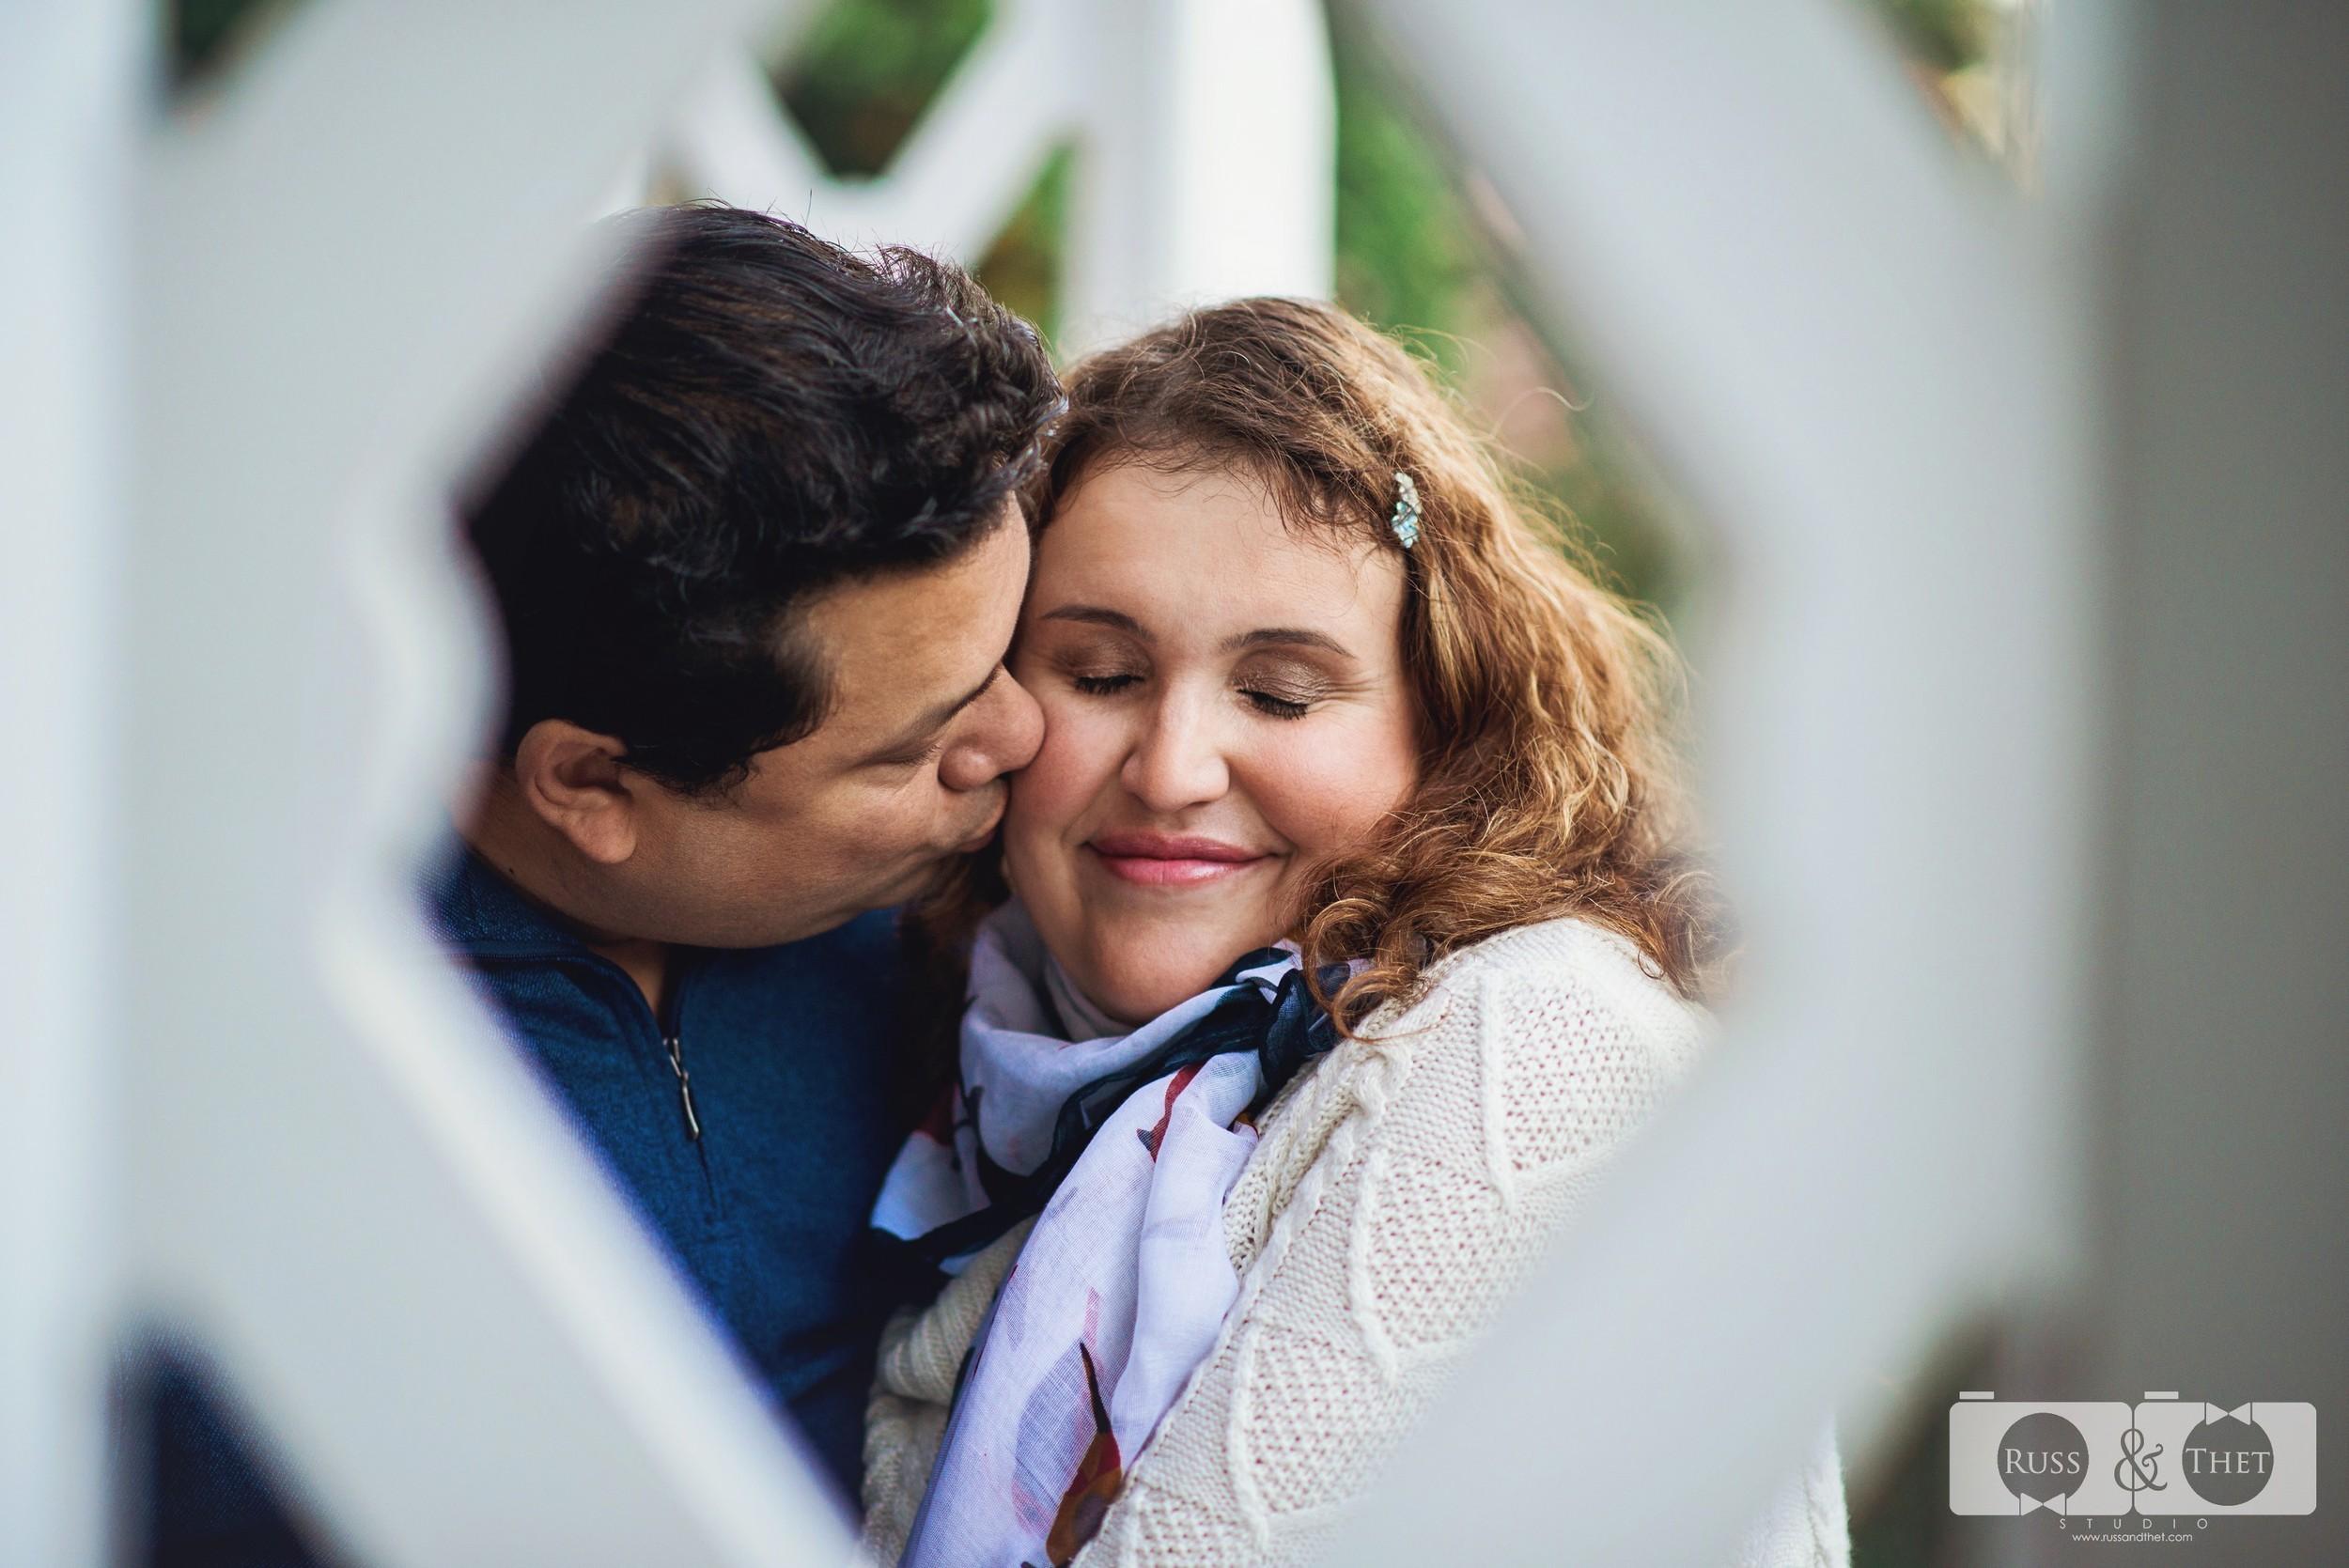 Hector&Vanessa-LA-Arboretum-Engagement-Photographer (12).jpg